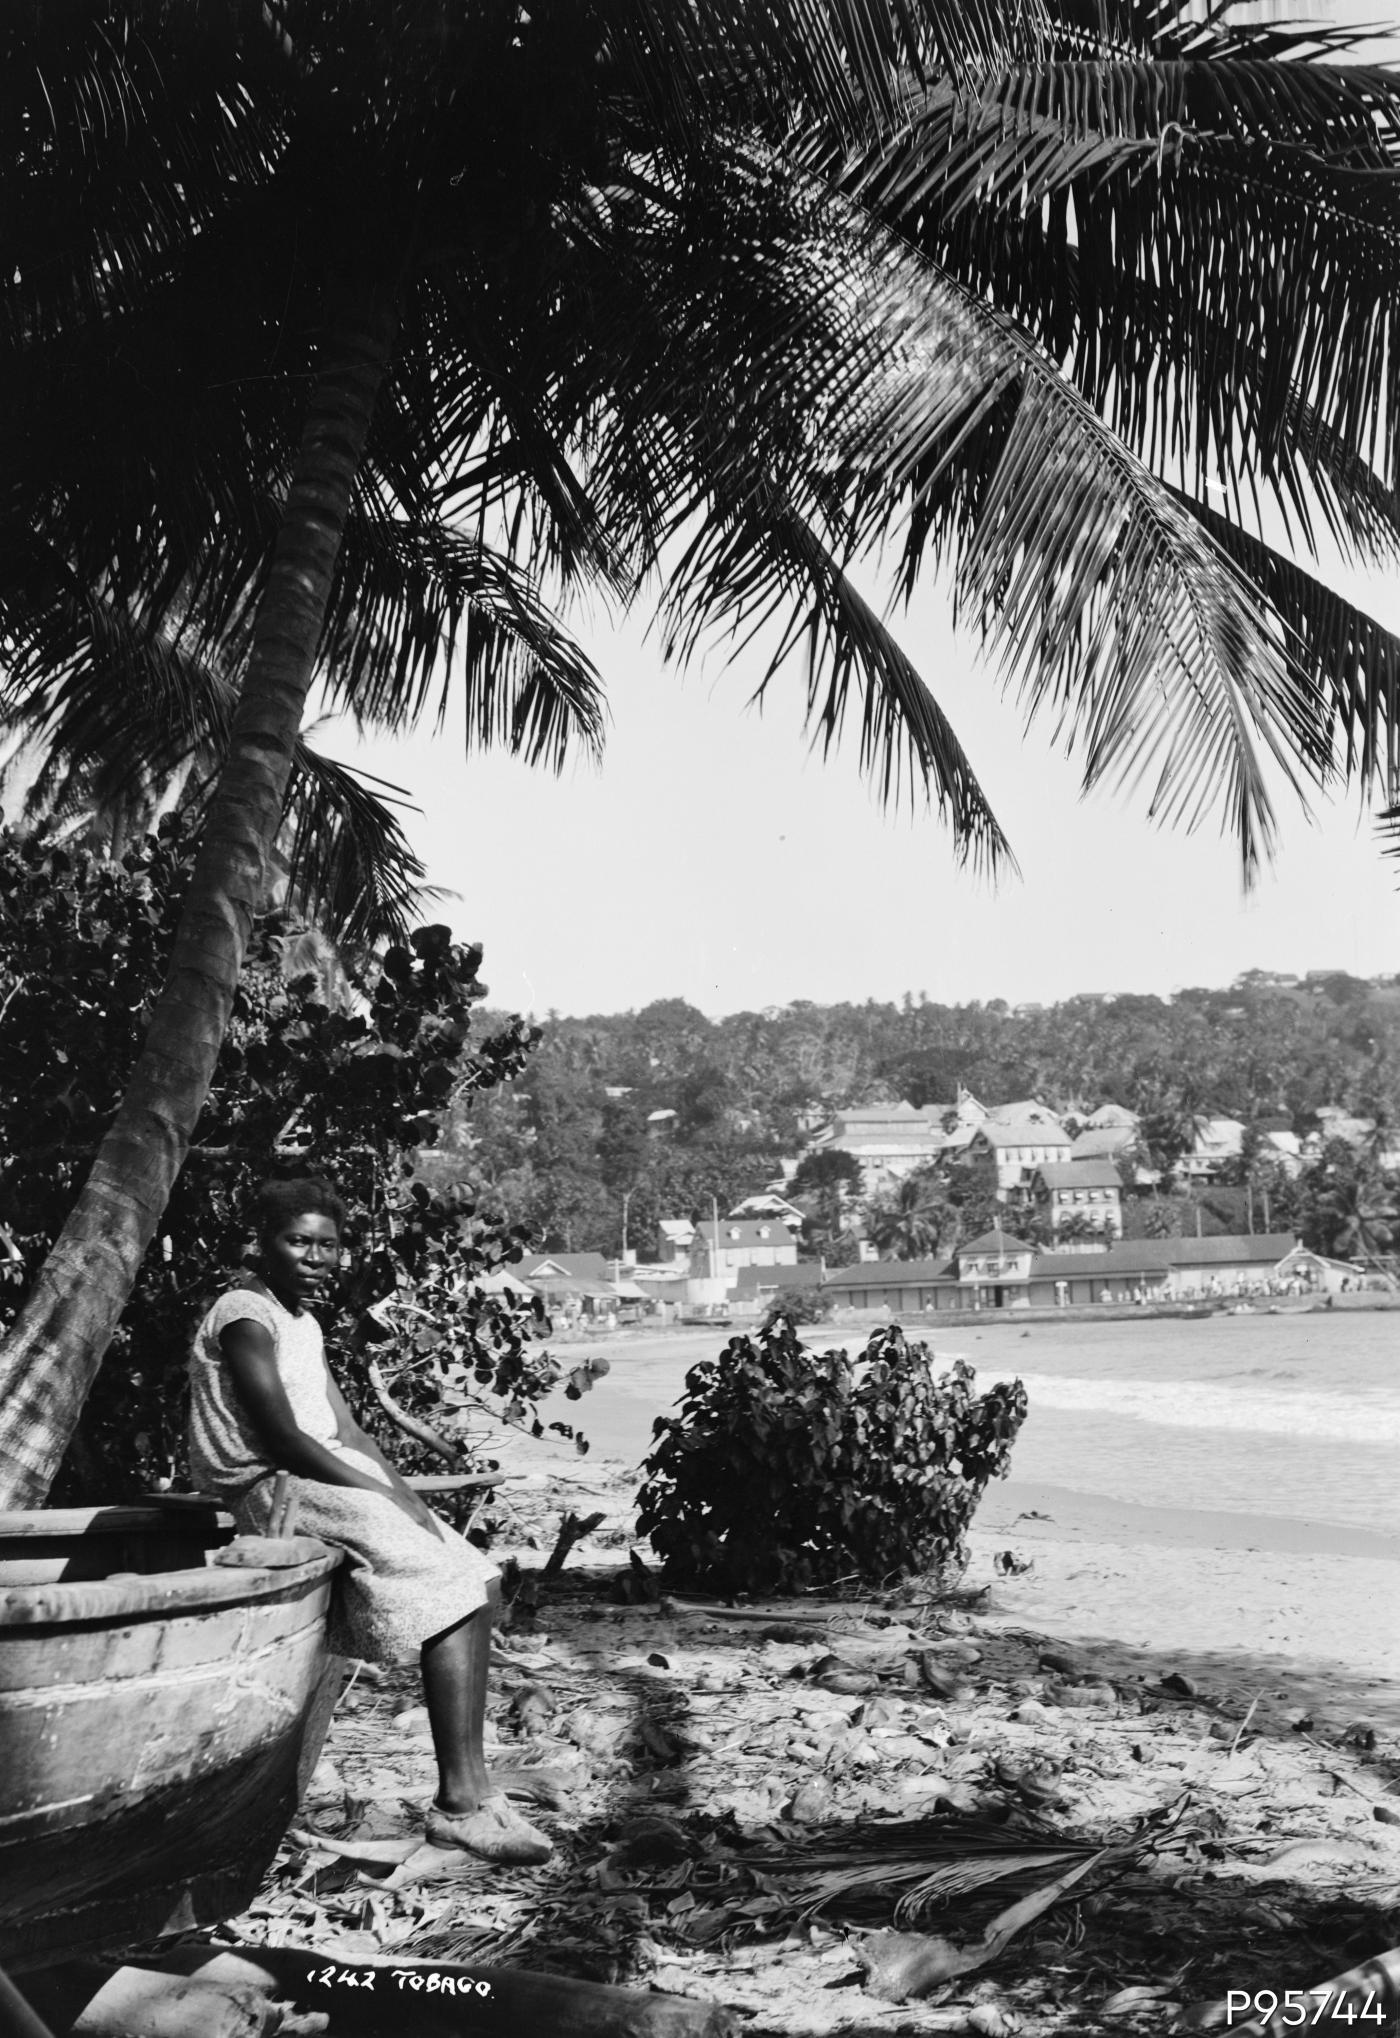 An image showing 'Scarborough, Tobago, West Indies'